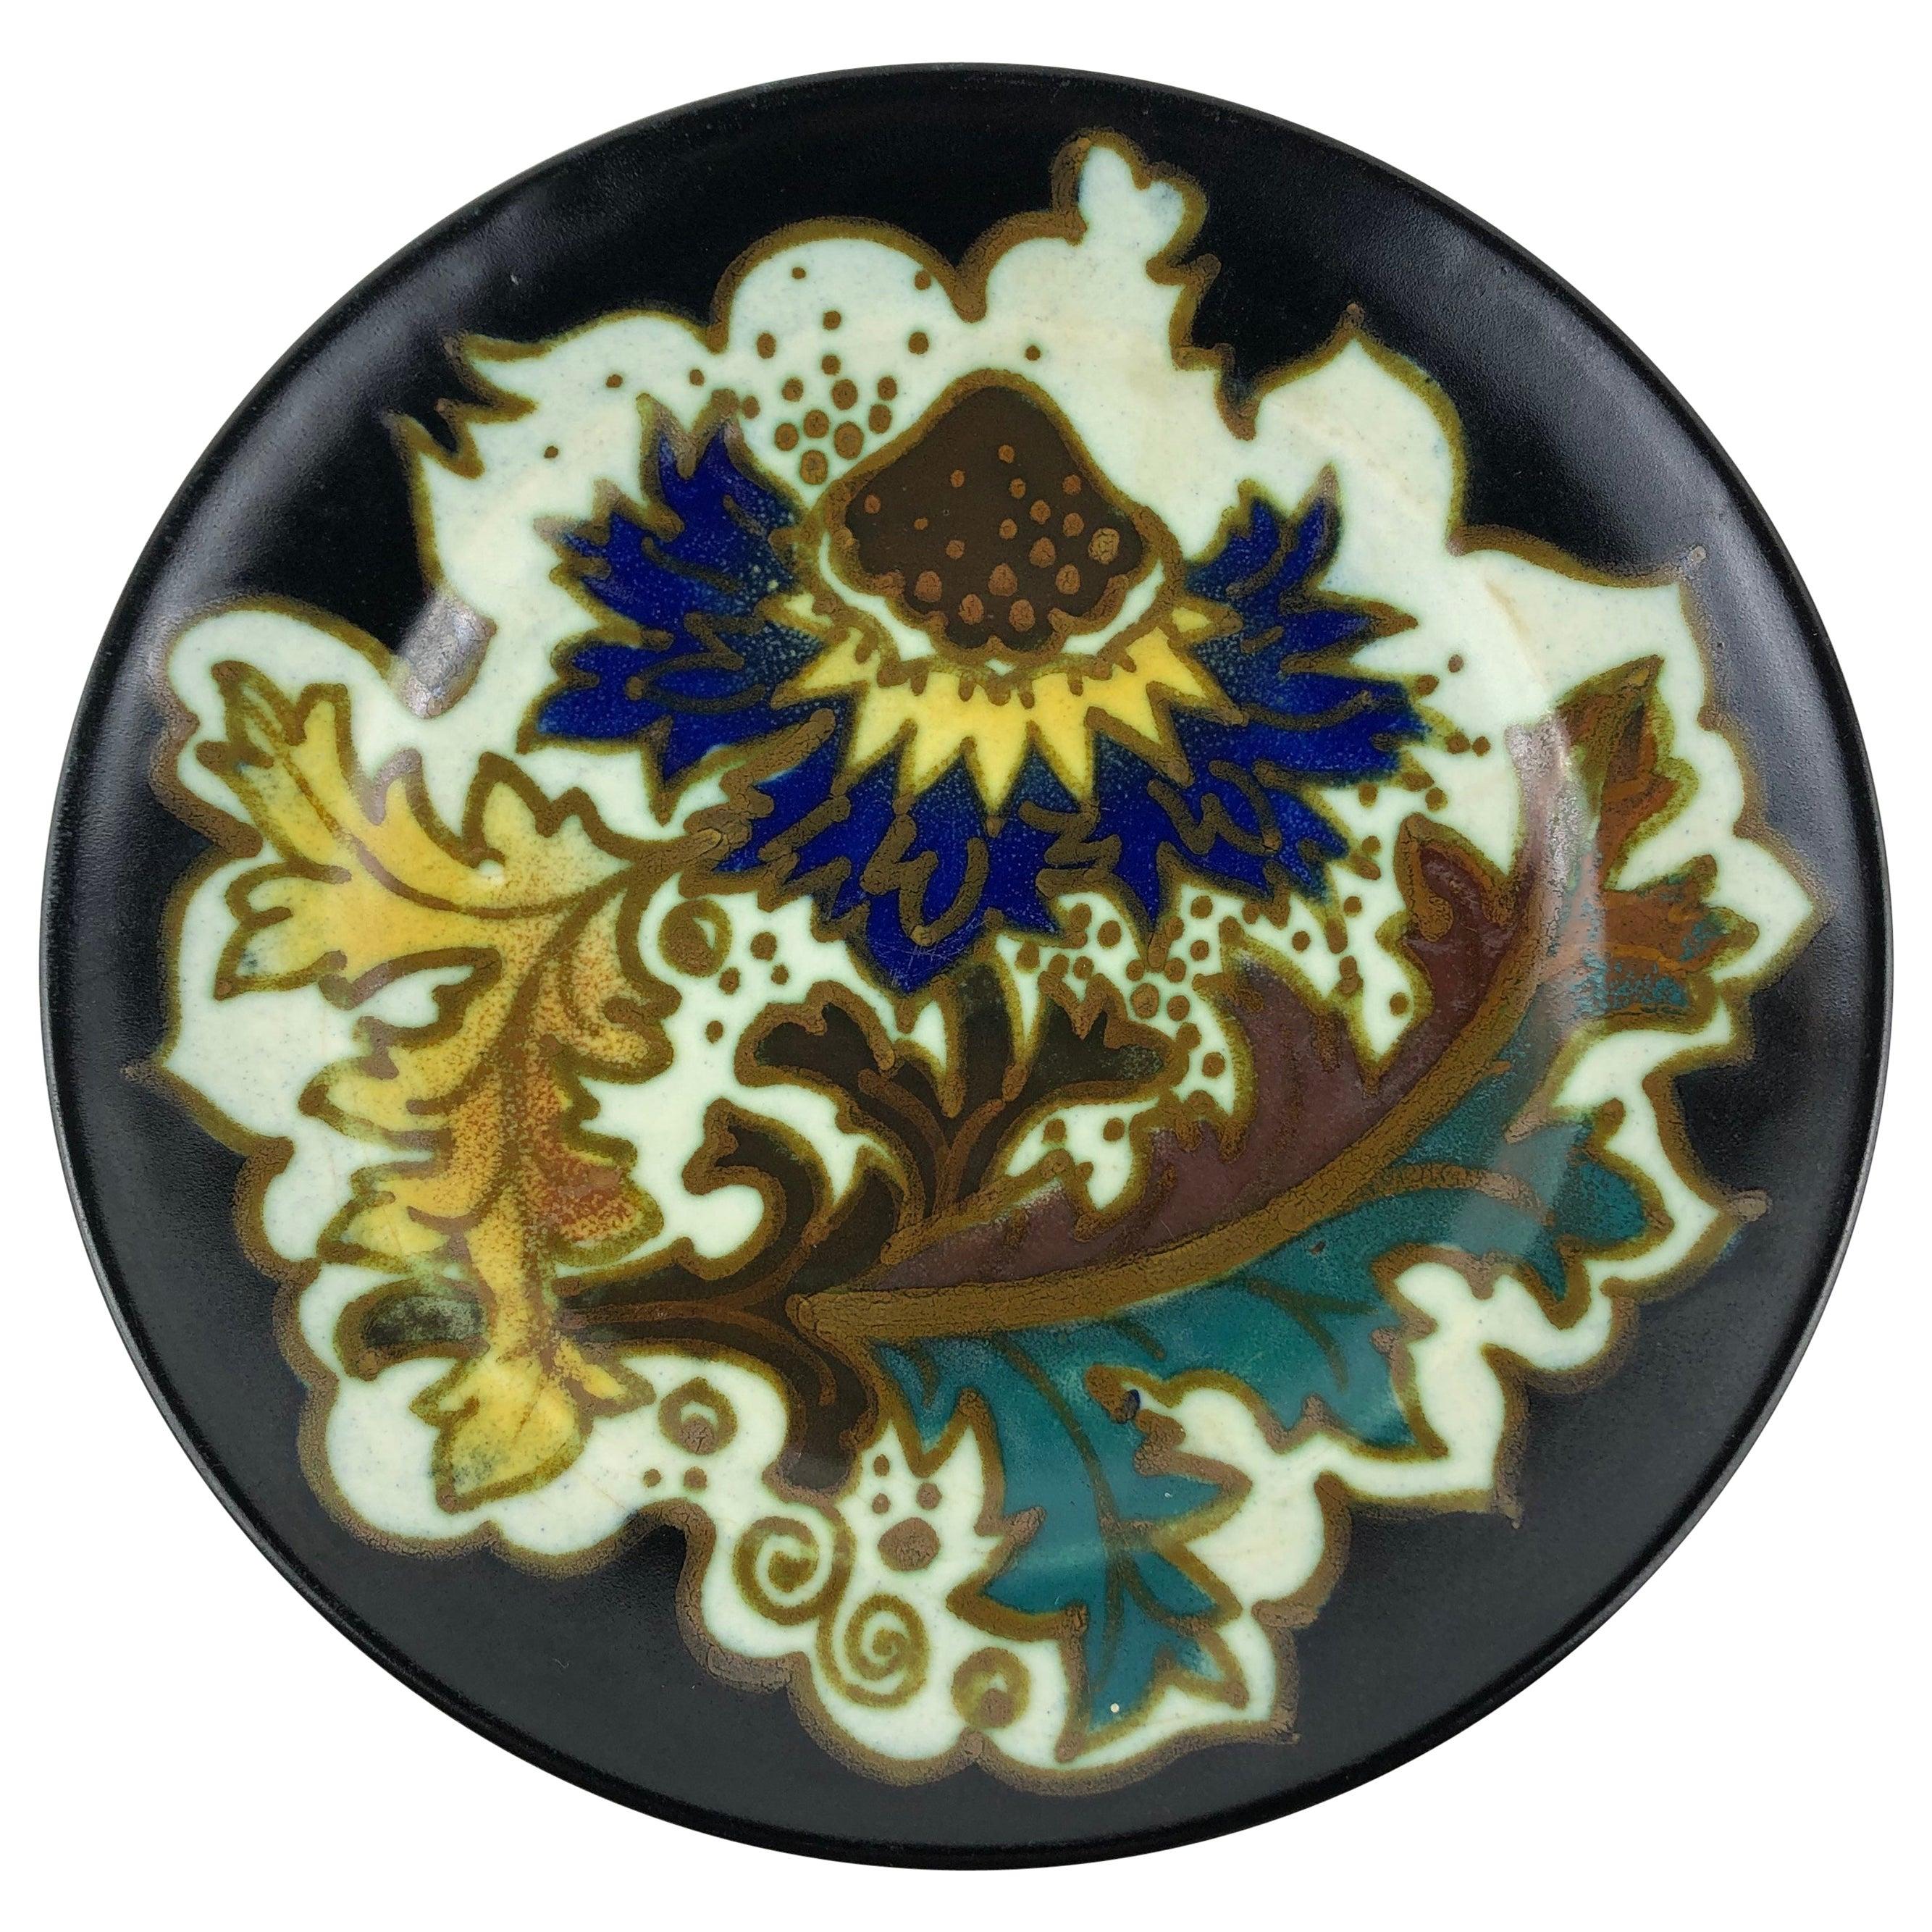 Gouda Pottery Art Nouveau Decorative Plate or Dish, Holland